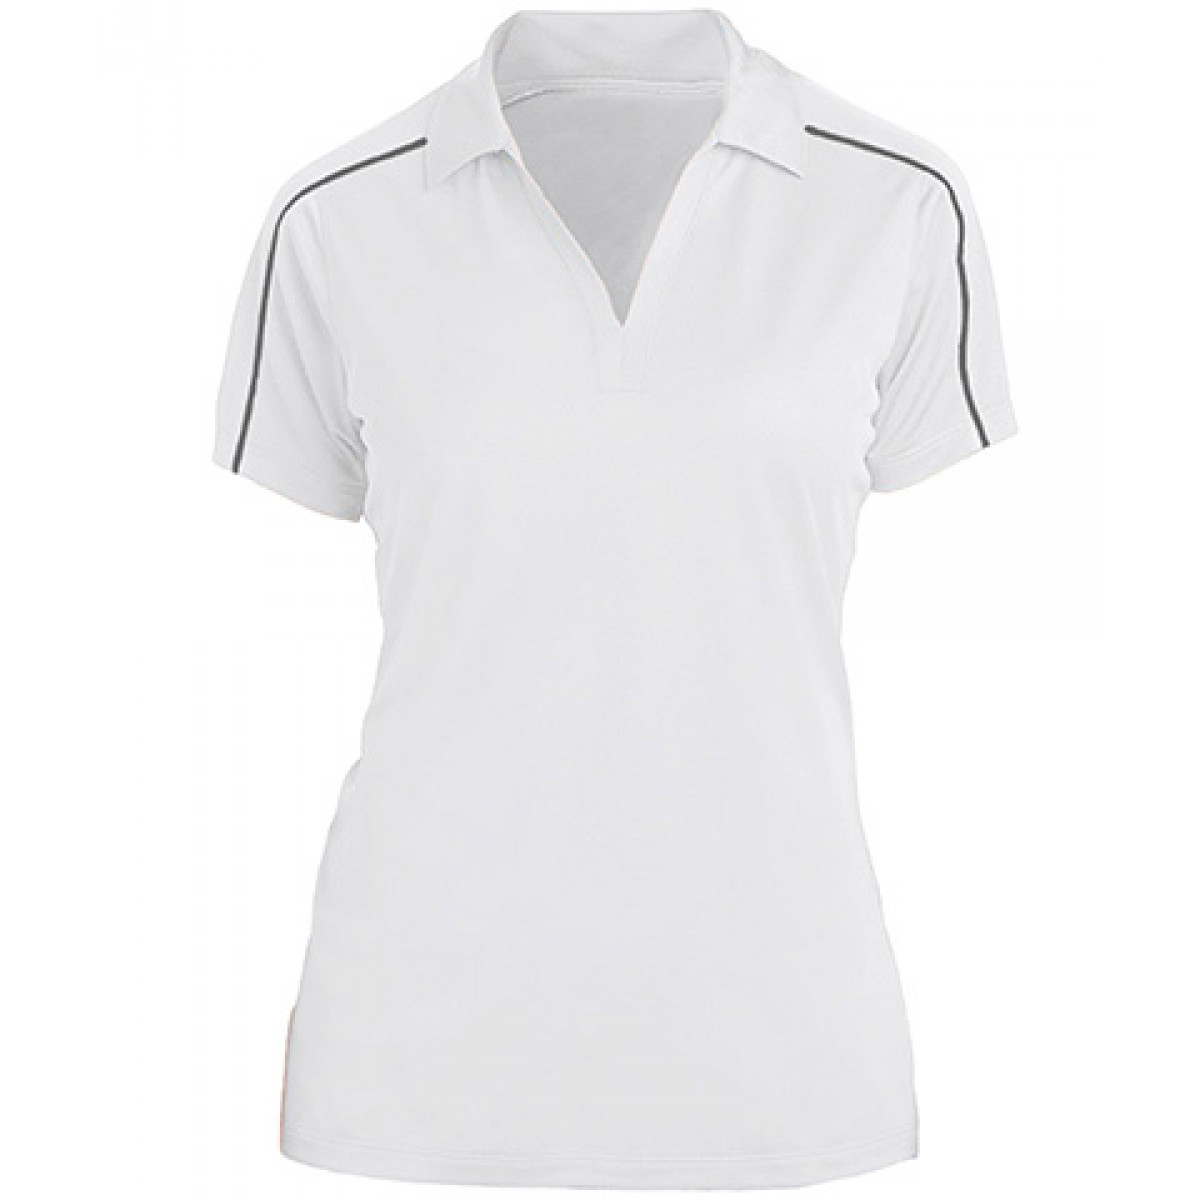 Sport-Tek Womens Piped Short Sleeve Polo -White-M